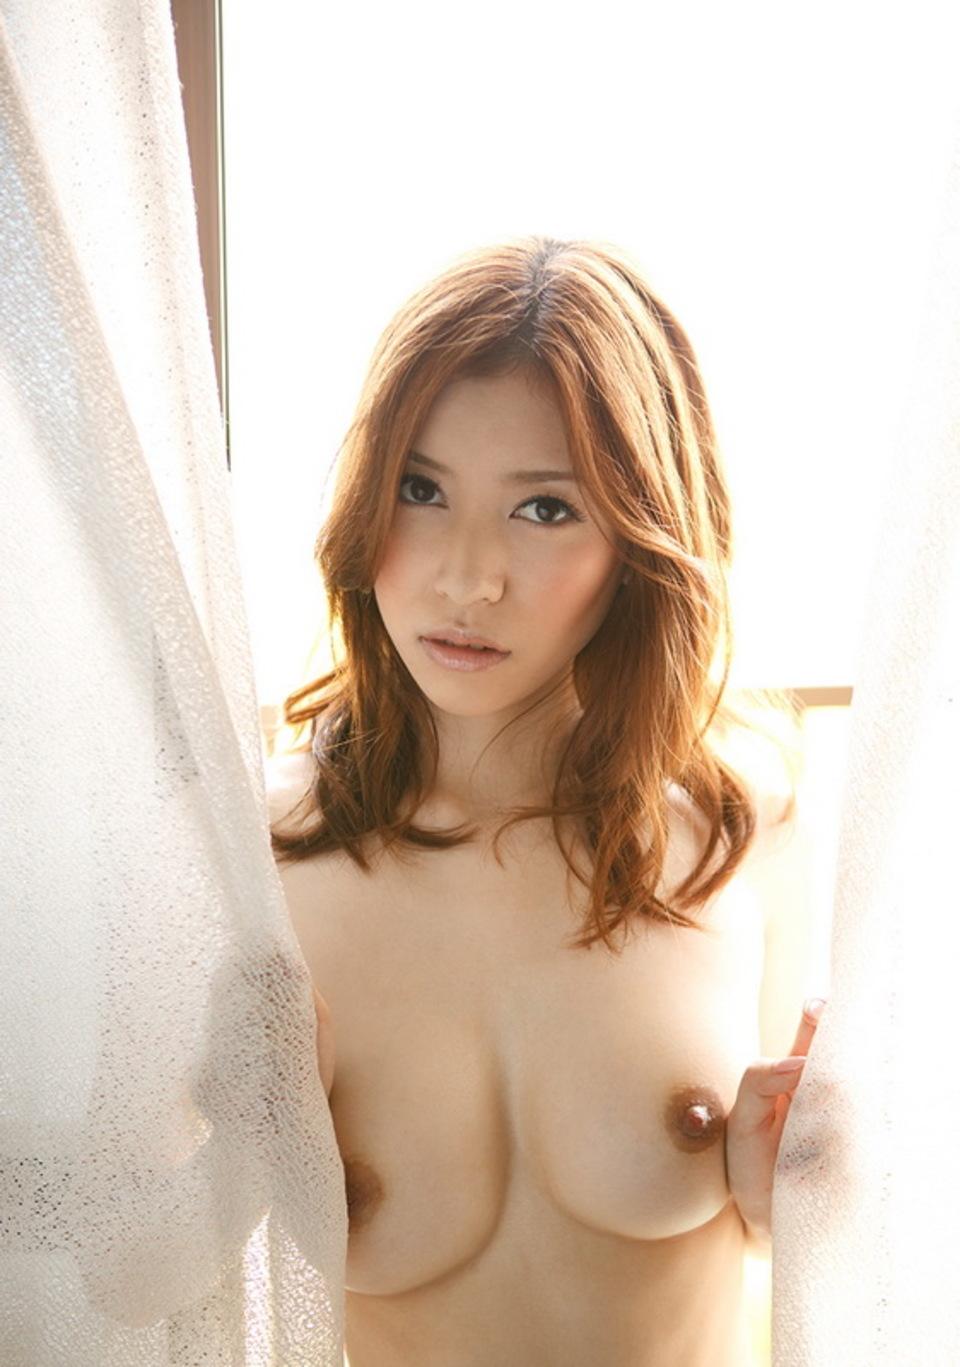 Zdjęcie porno - 0416 - Ruda Azjatka